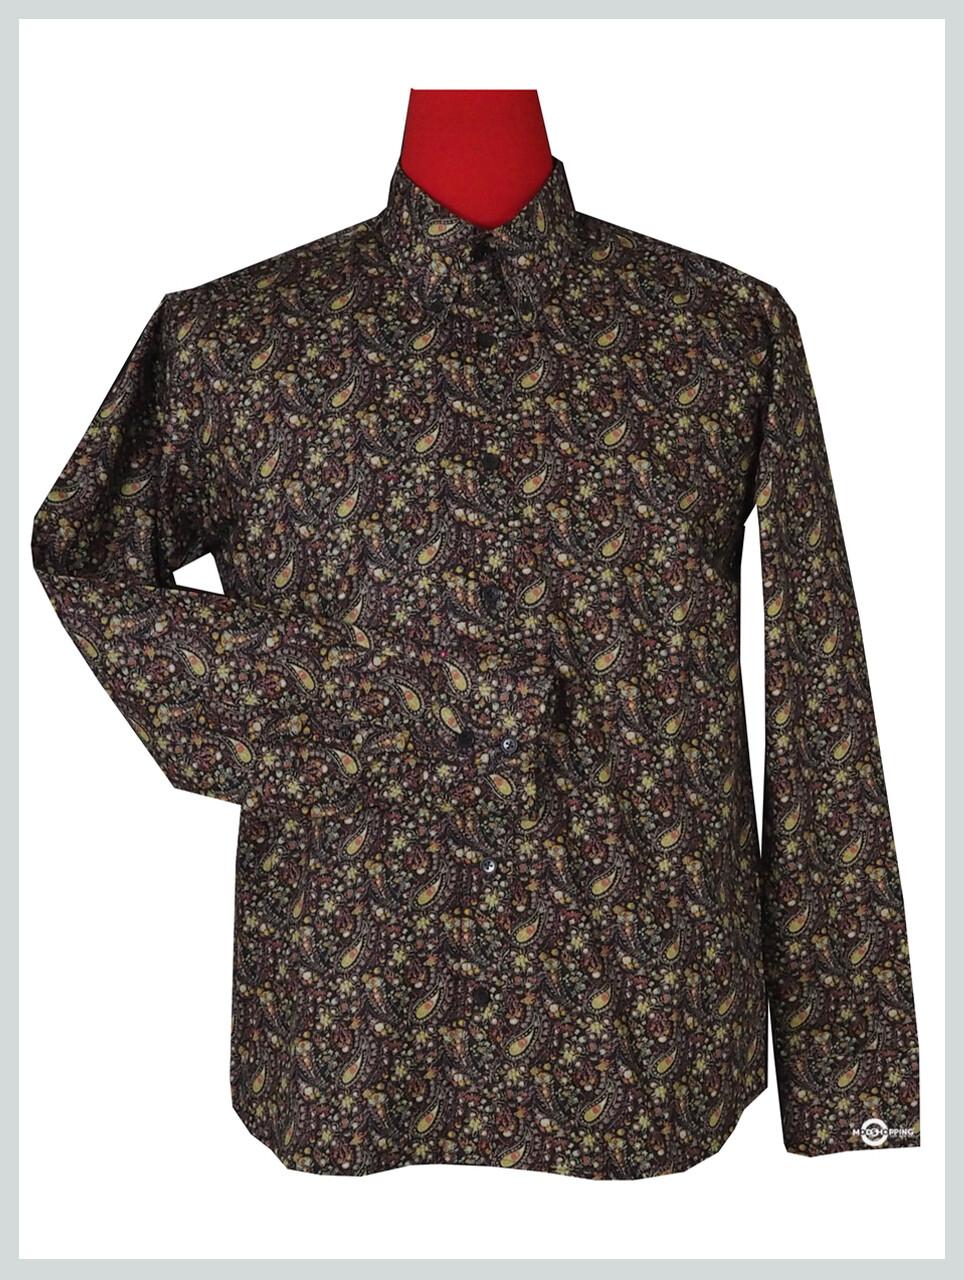 Paisley Shirt| Flower Pattern Shirt For Man